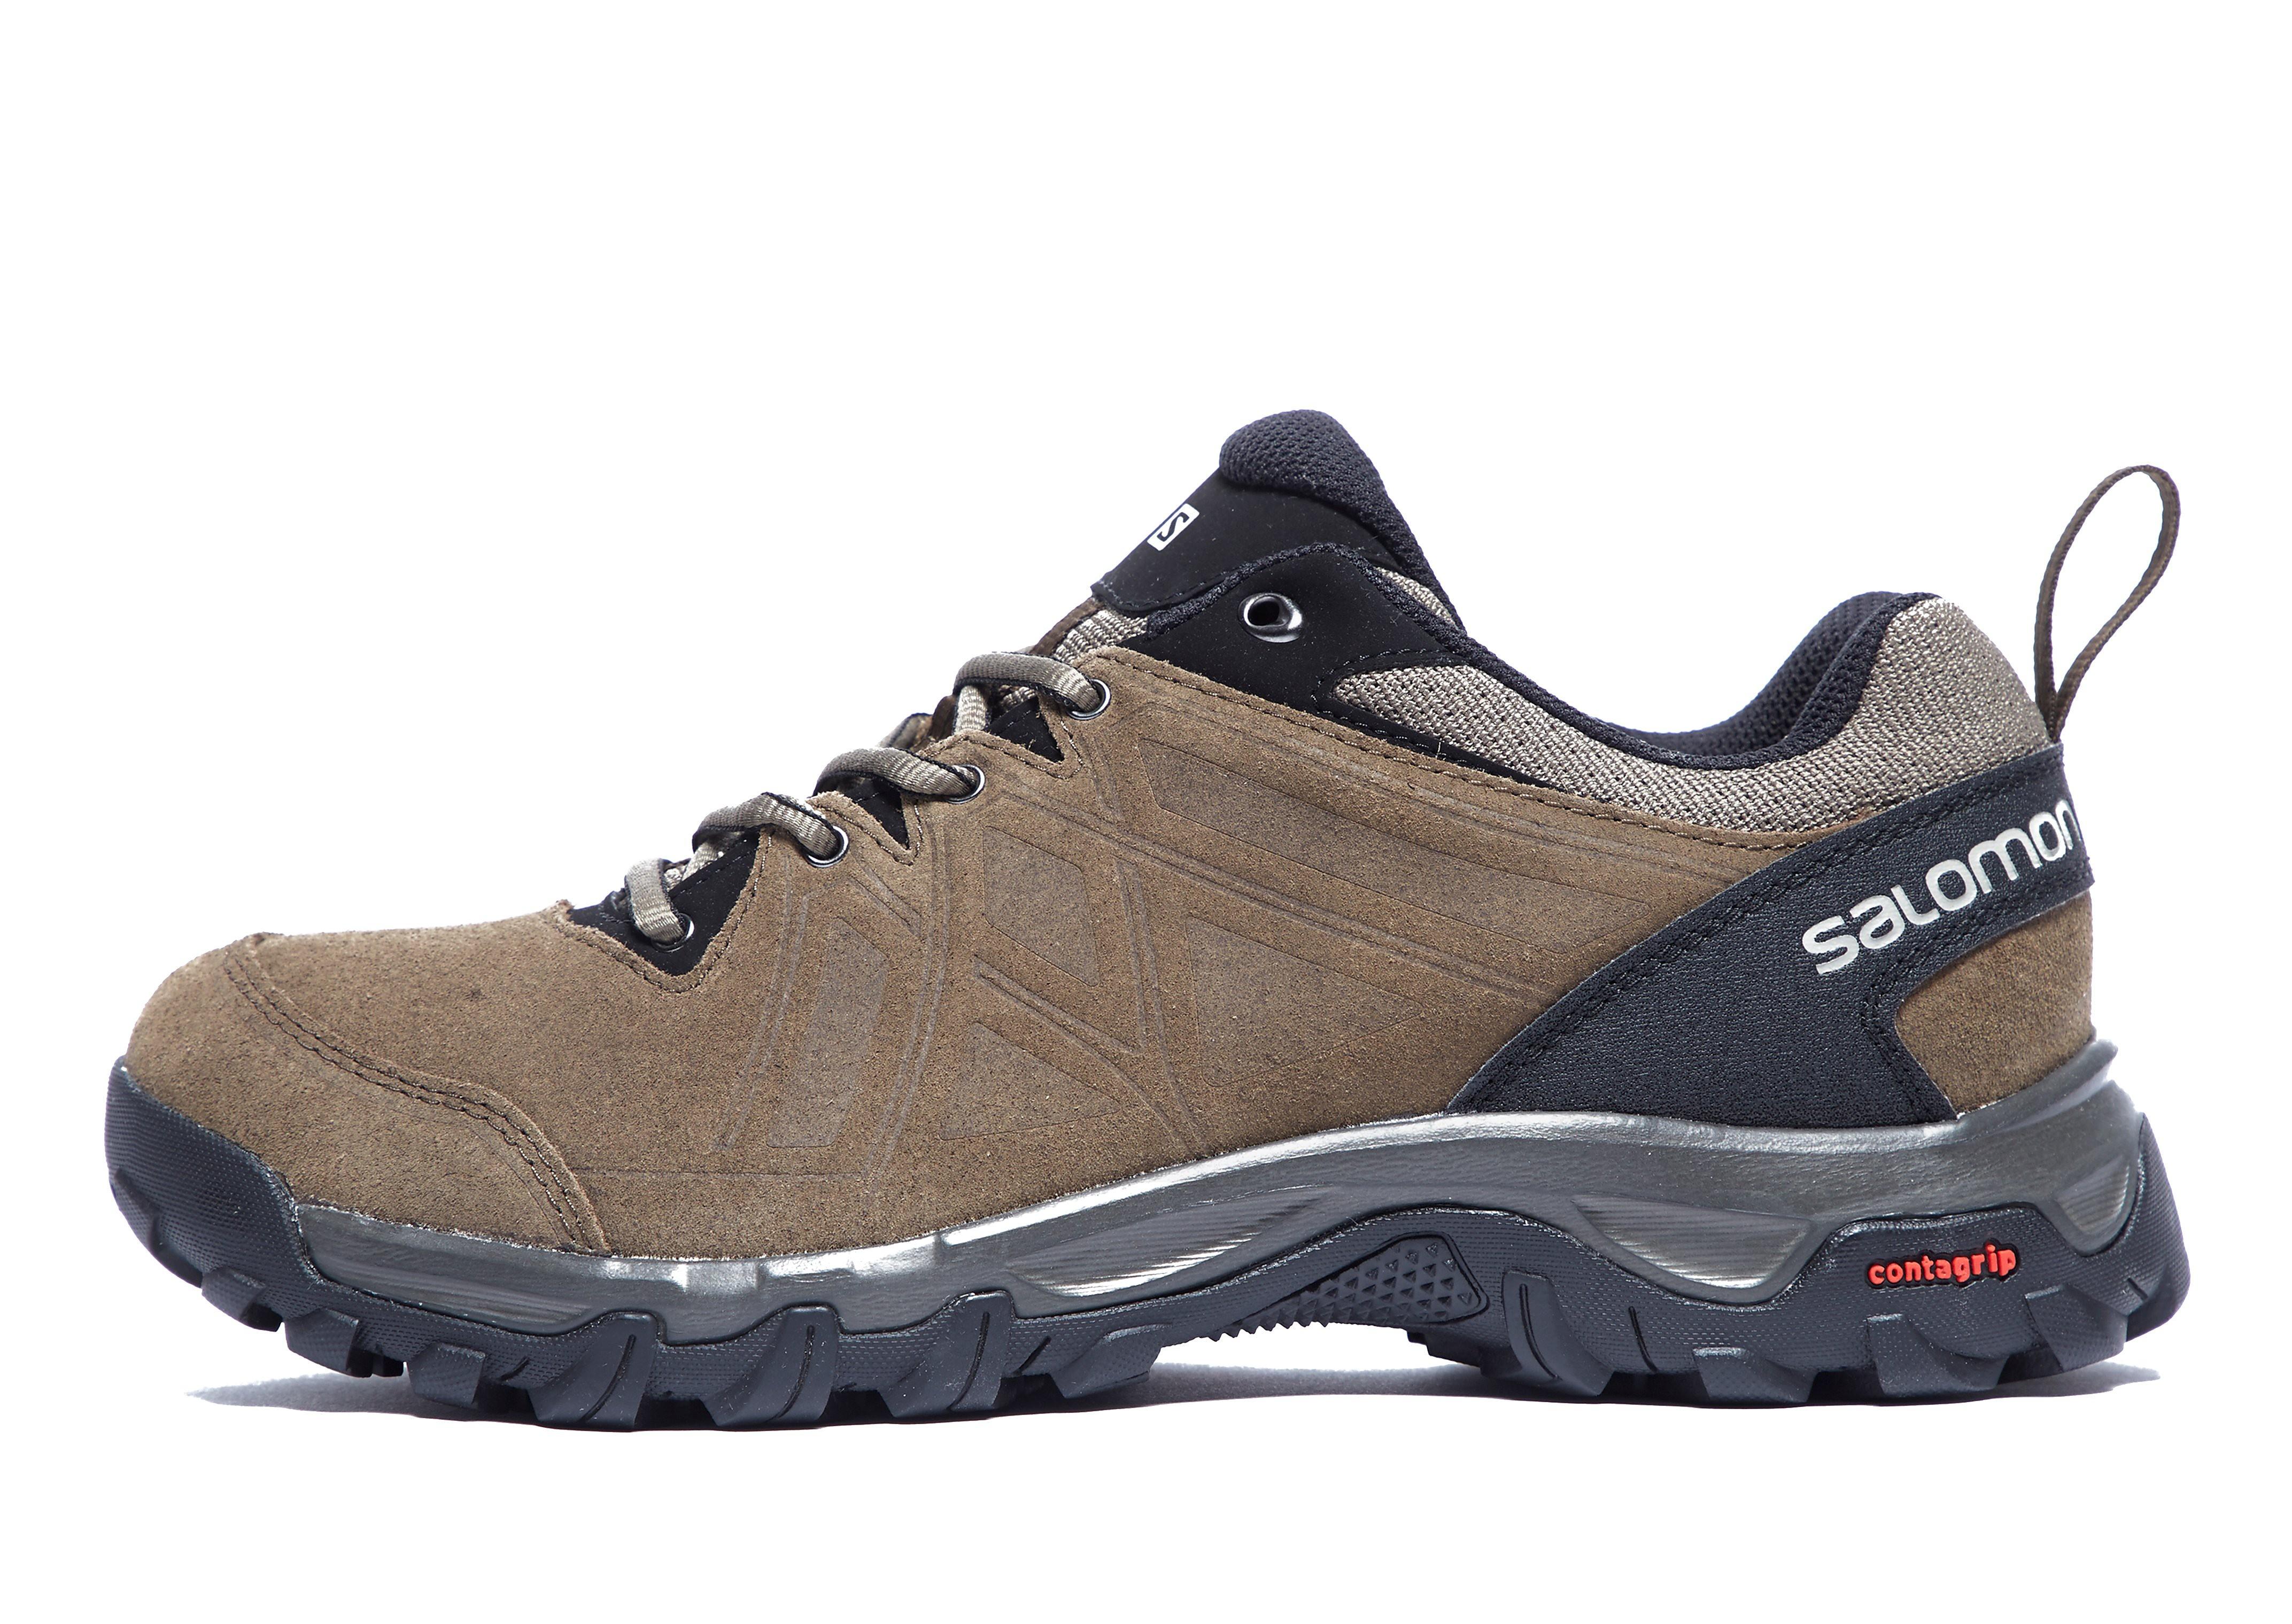 Salomon Evastion 2 Hiking Shoes